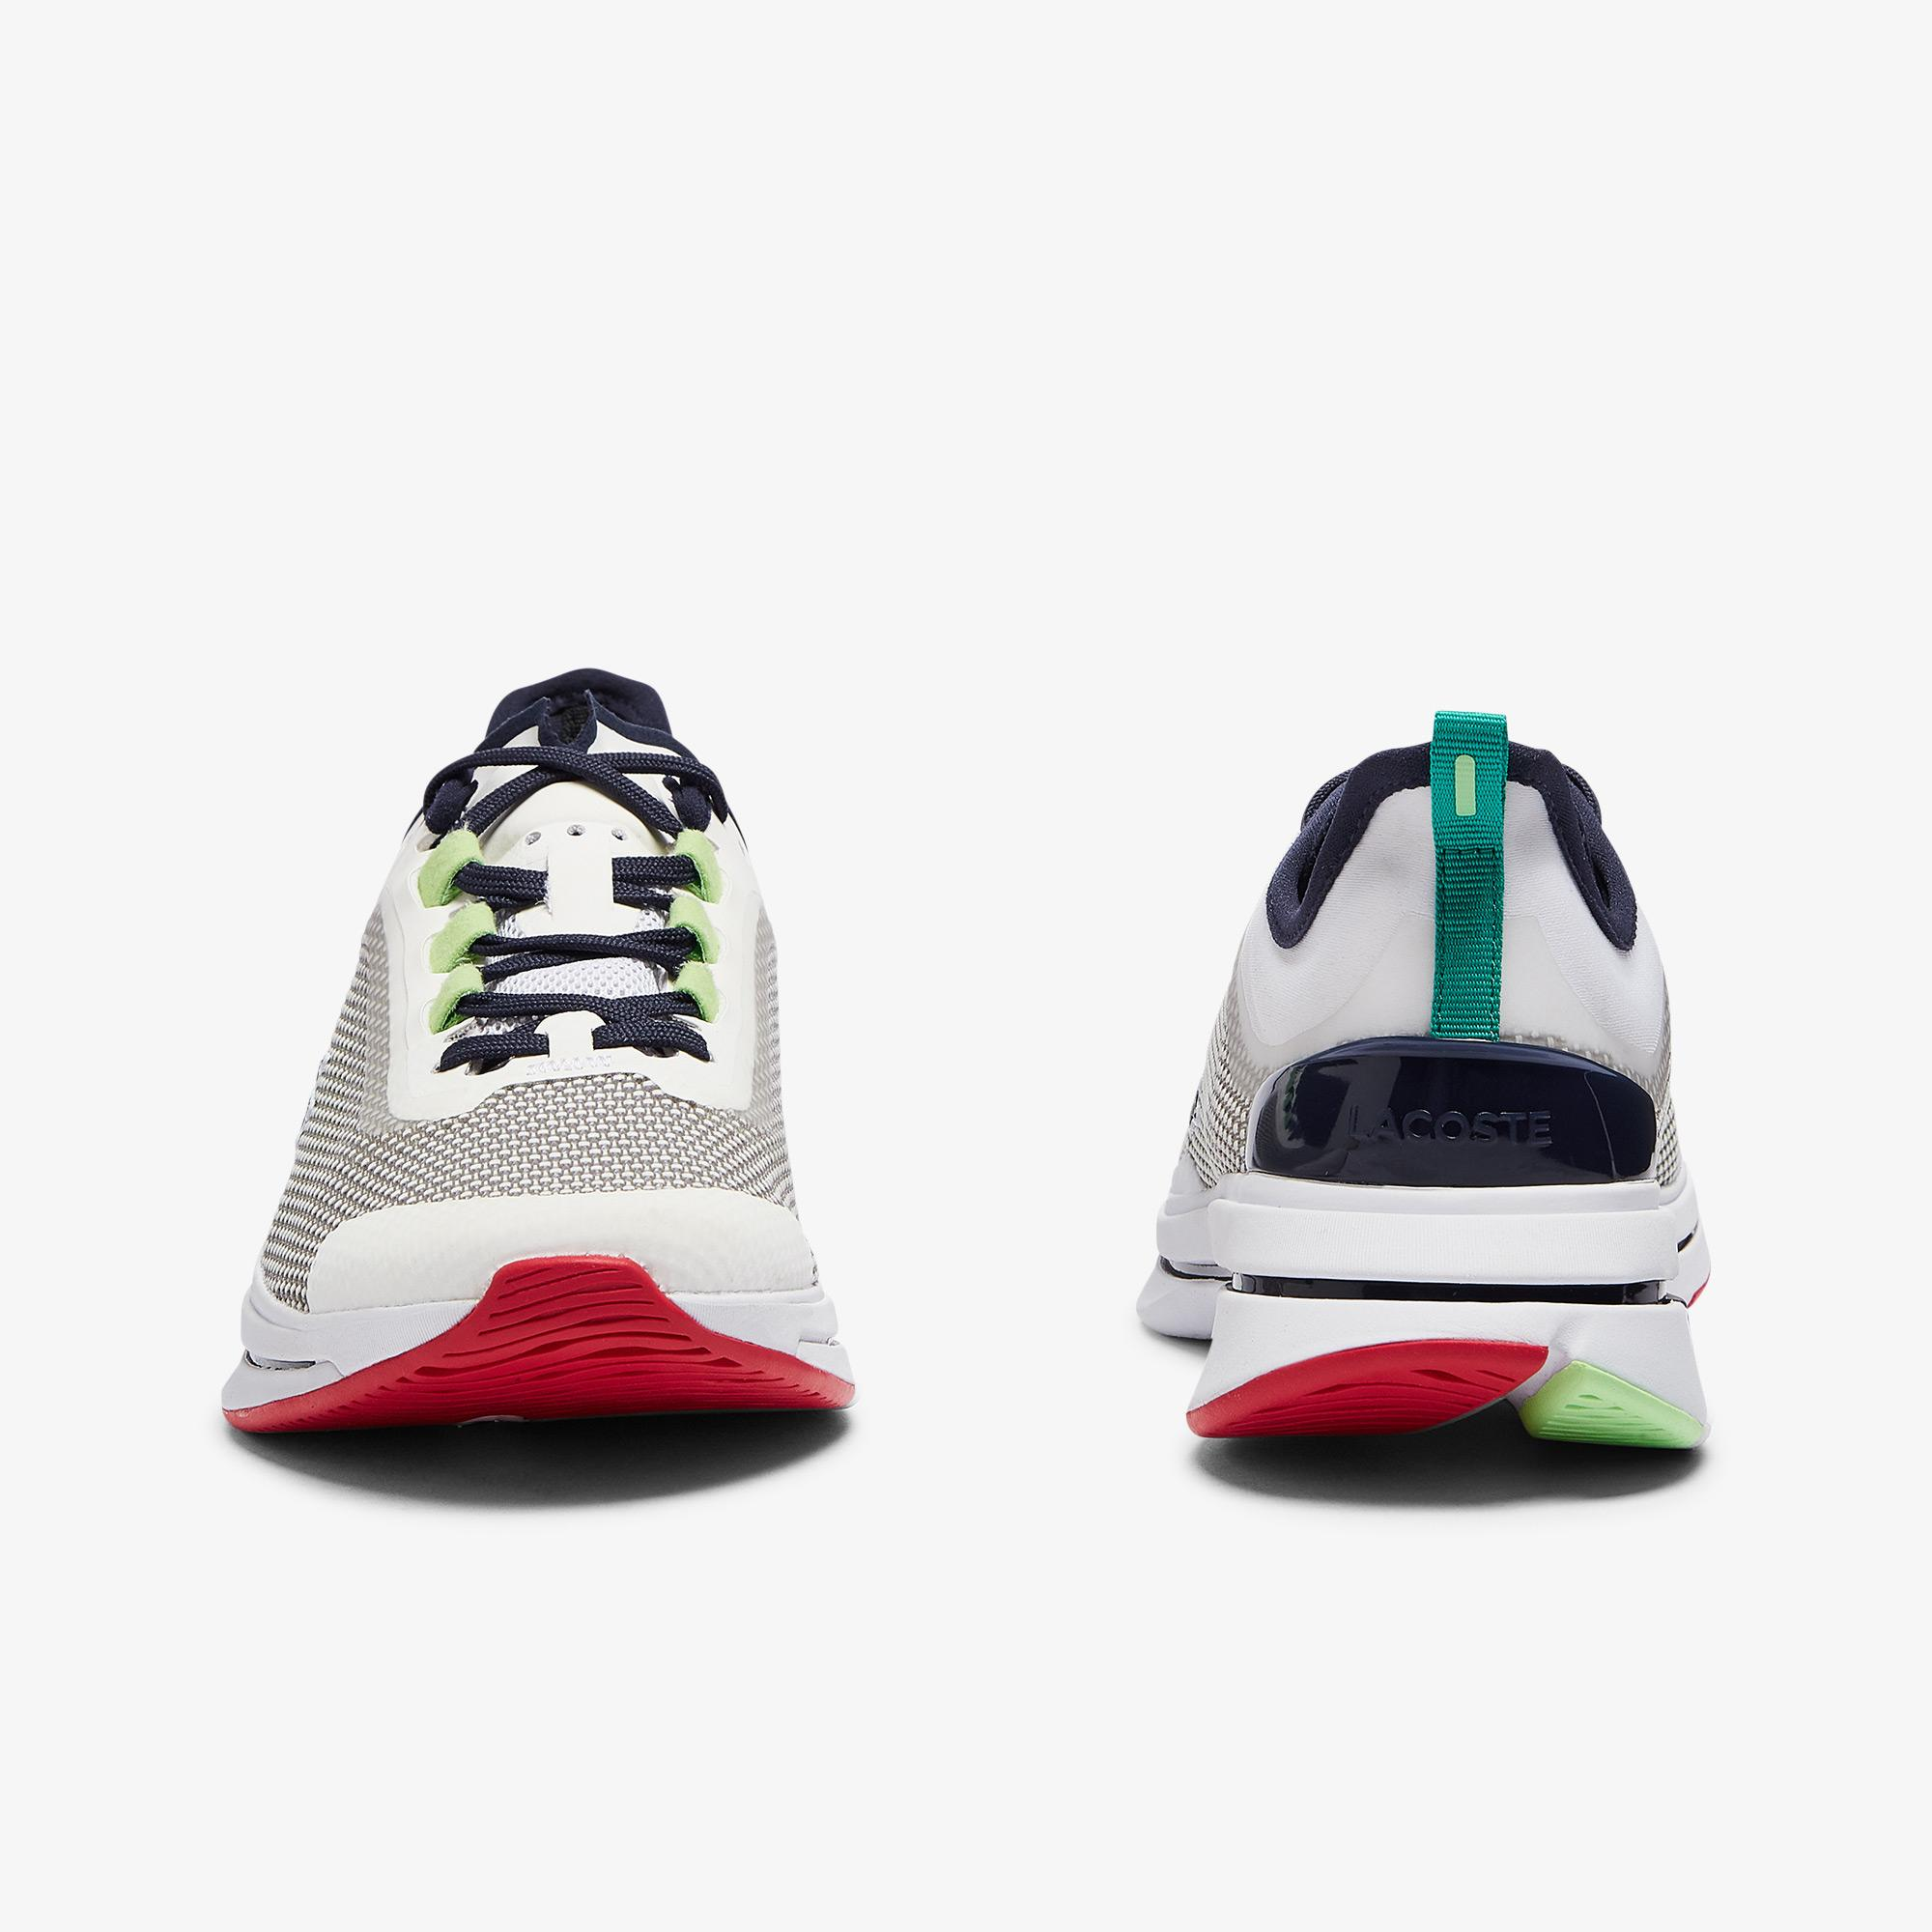 Lacoste Run Spin Ultra 0921 1 Sfa Kadın Deri Renkli Sneaker